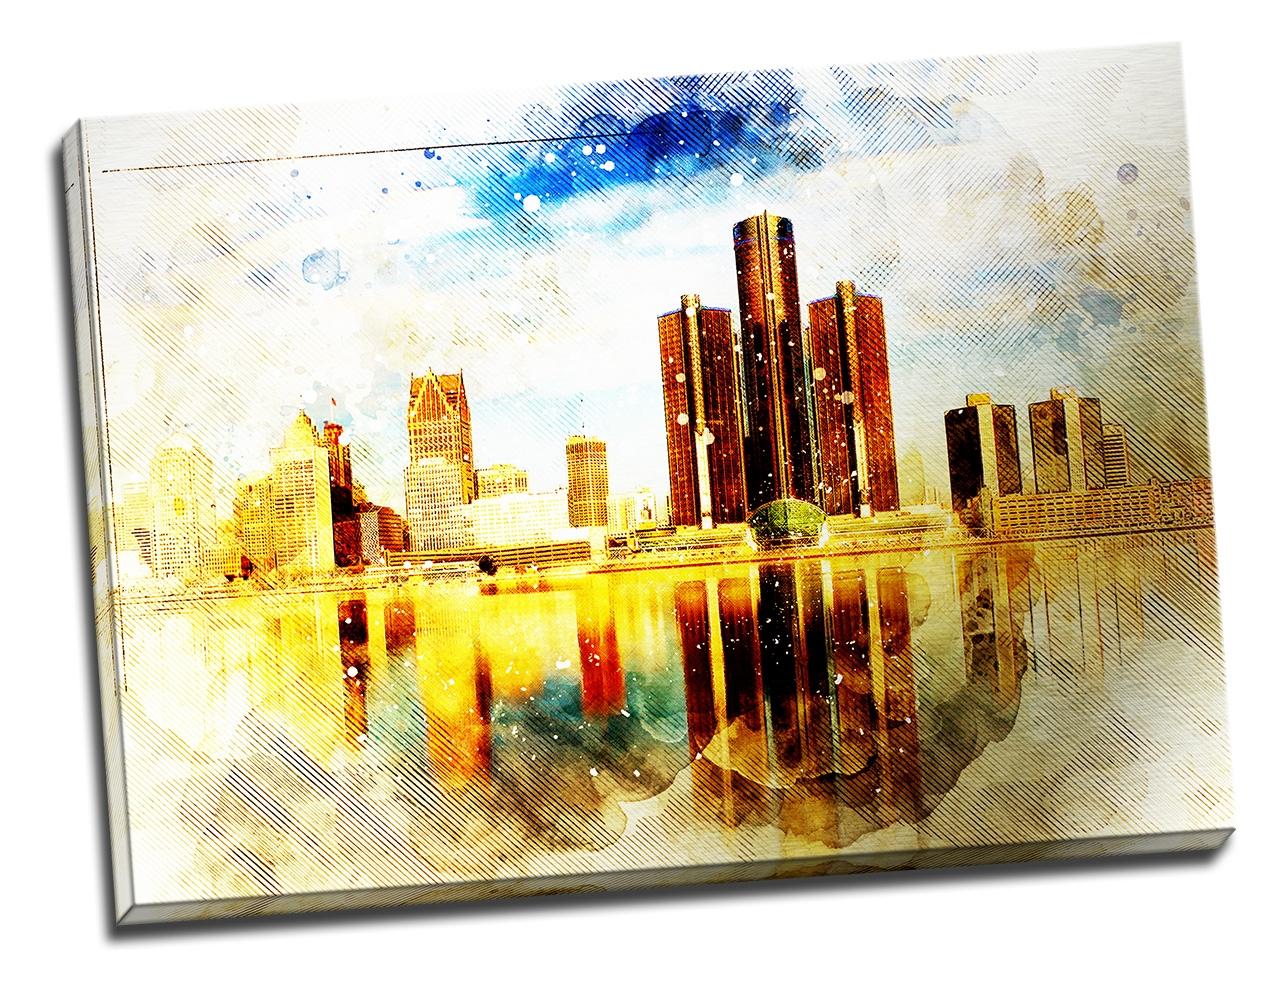 Tablou din aluminiu striat Cityscape